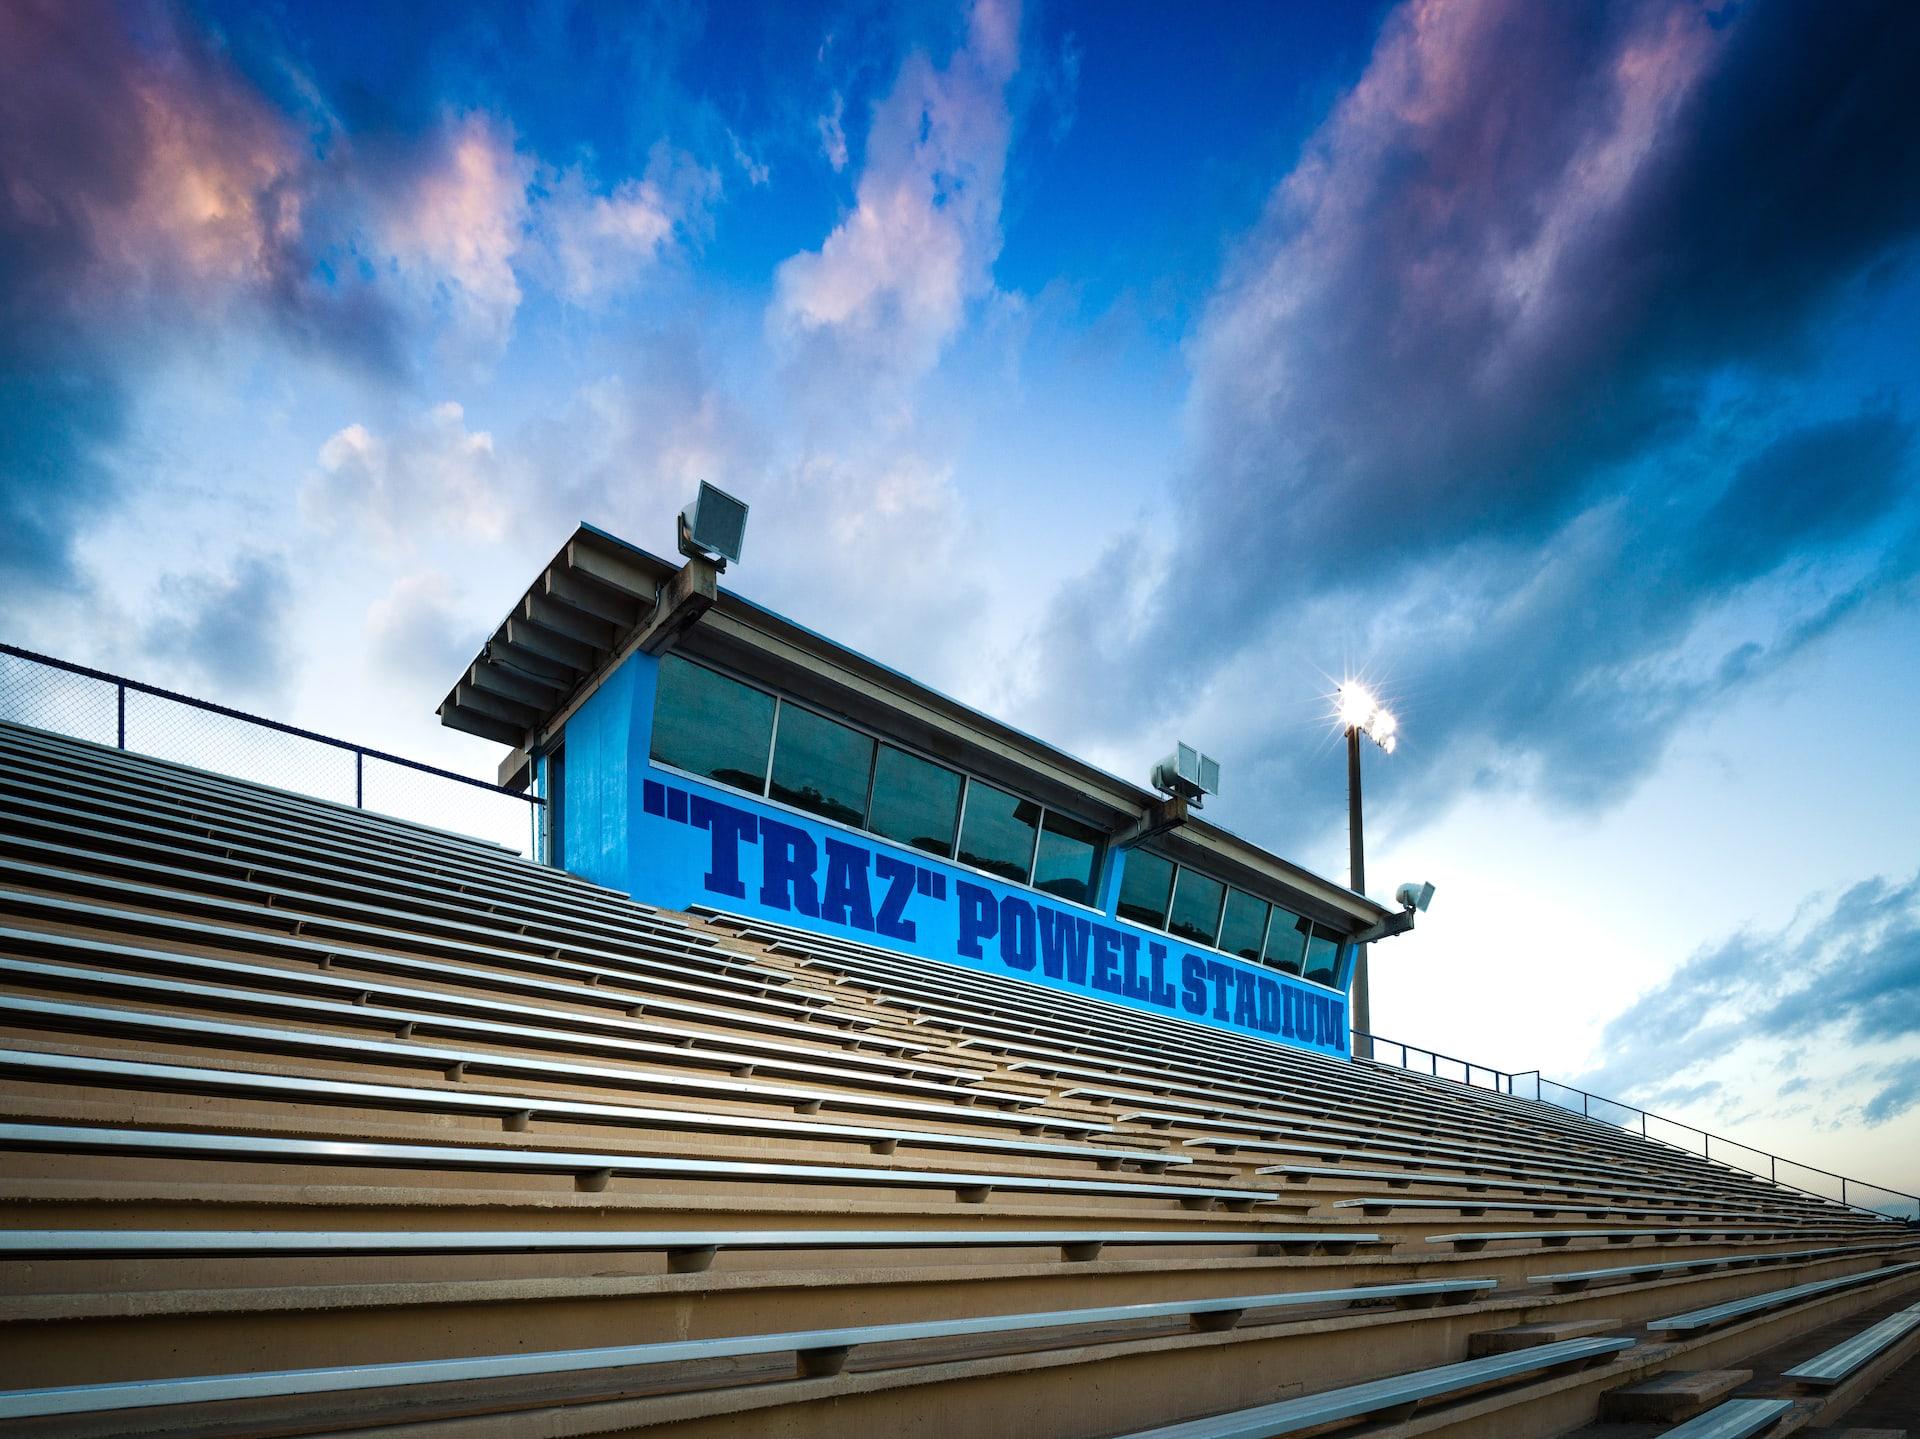 Nike Nathaniel Traz-Powell Stadium (Bleachers)